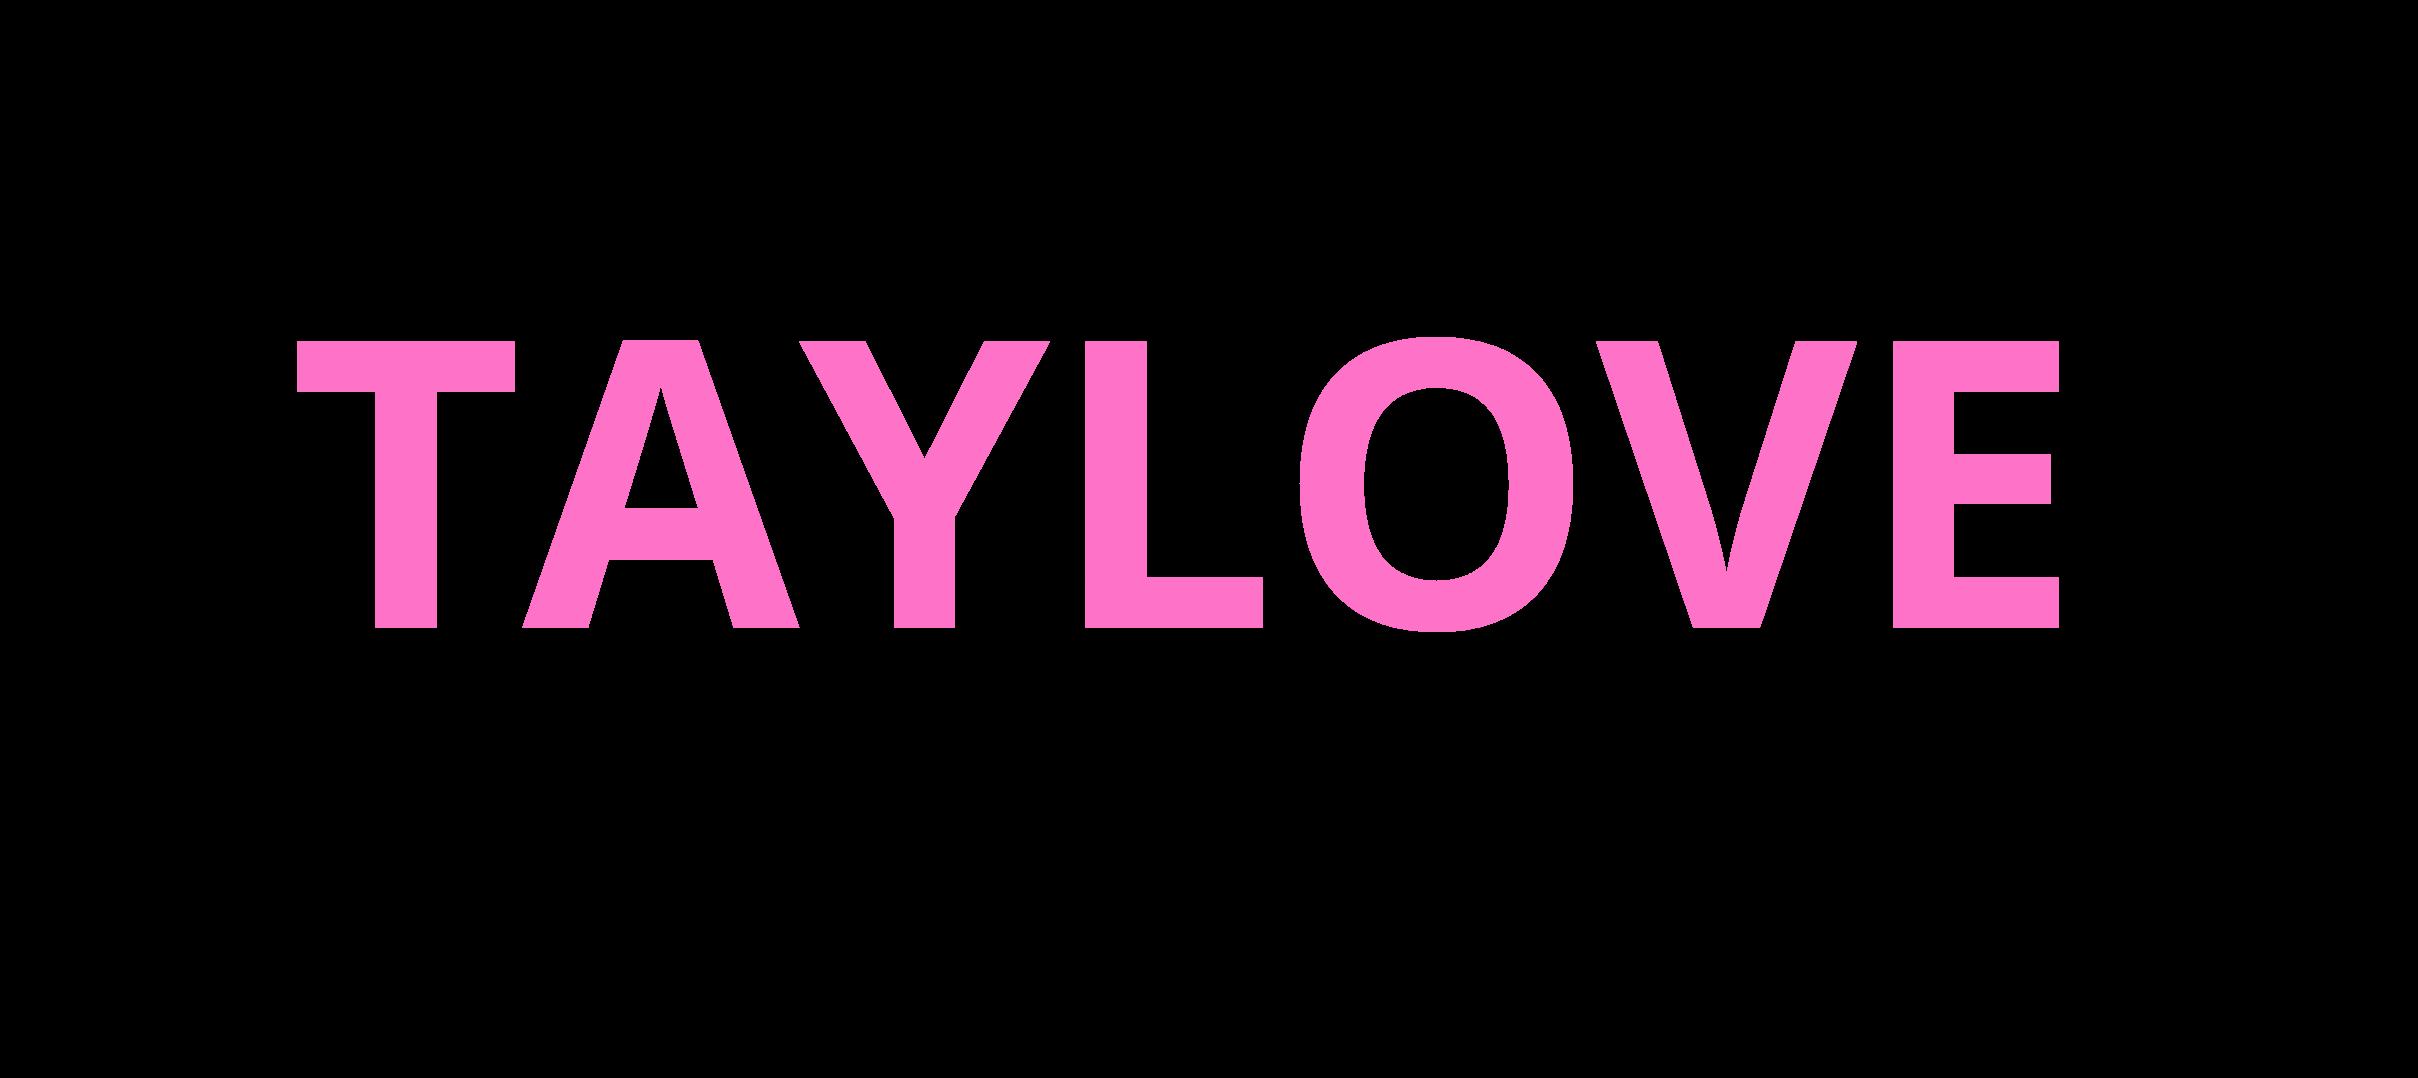 TAYLOVE